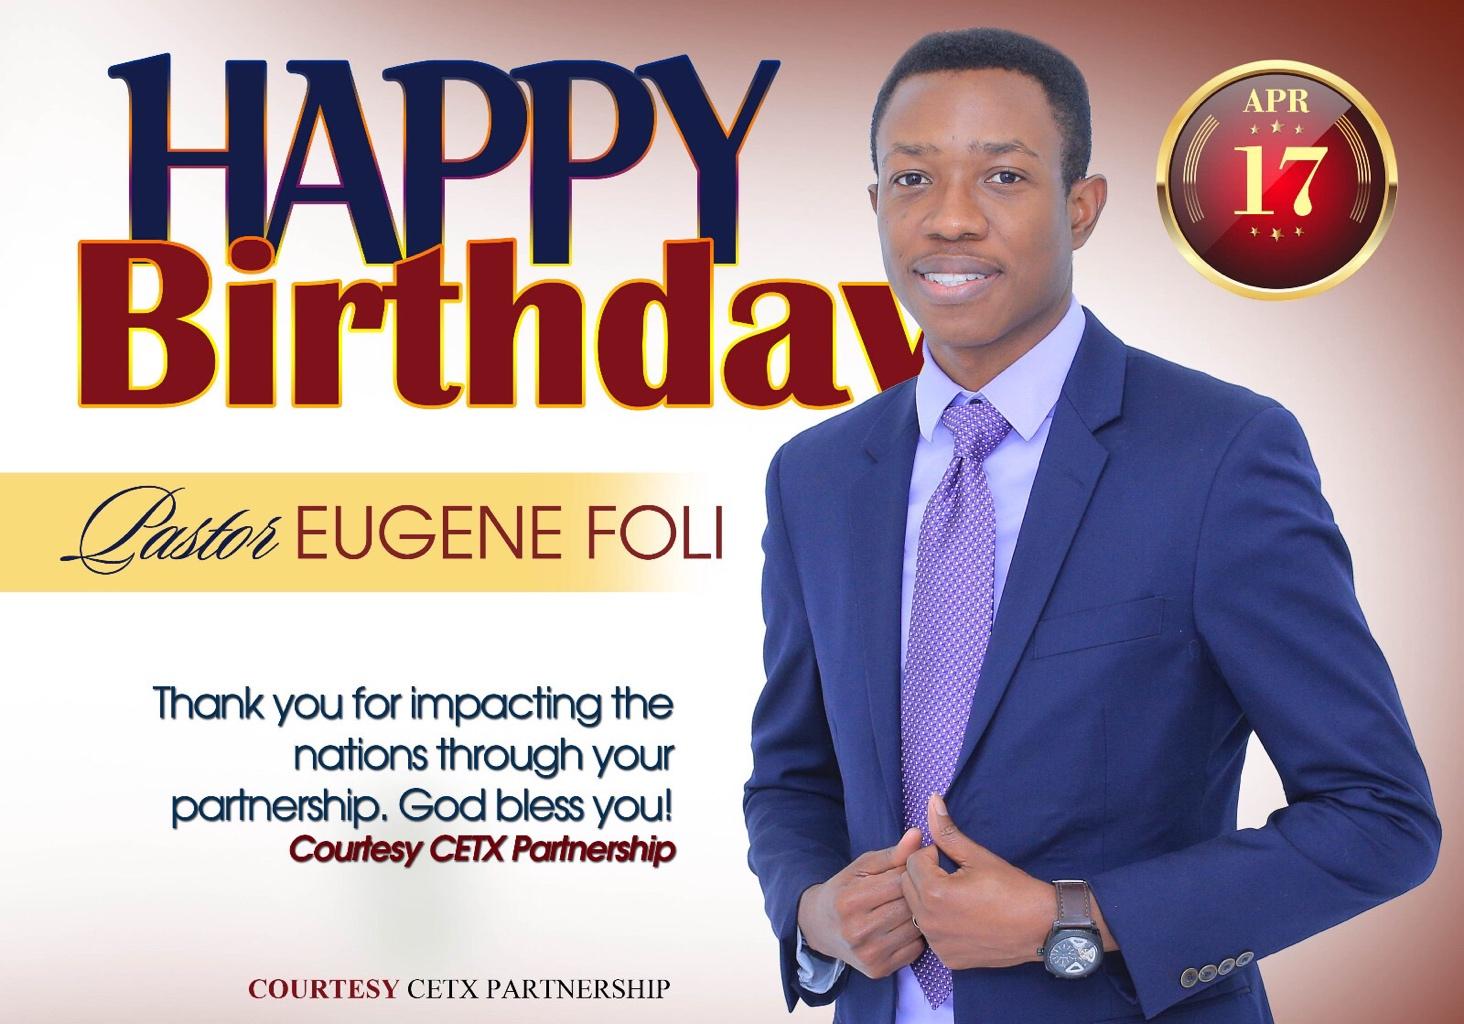 Happy birthday Pastor Eugene. Congratulations